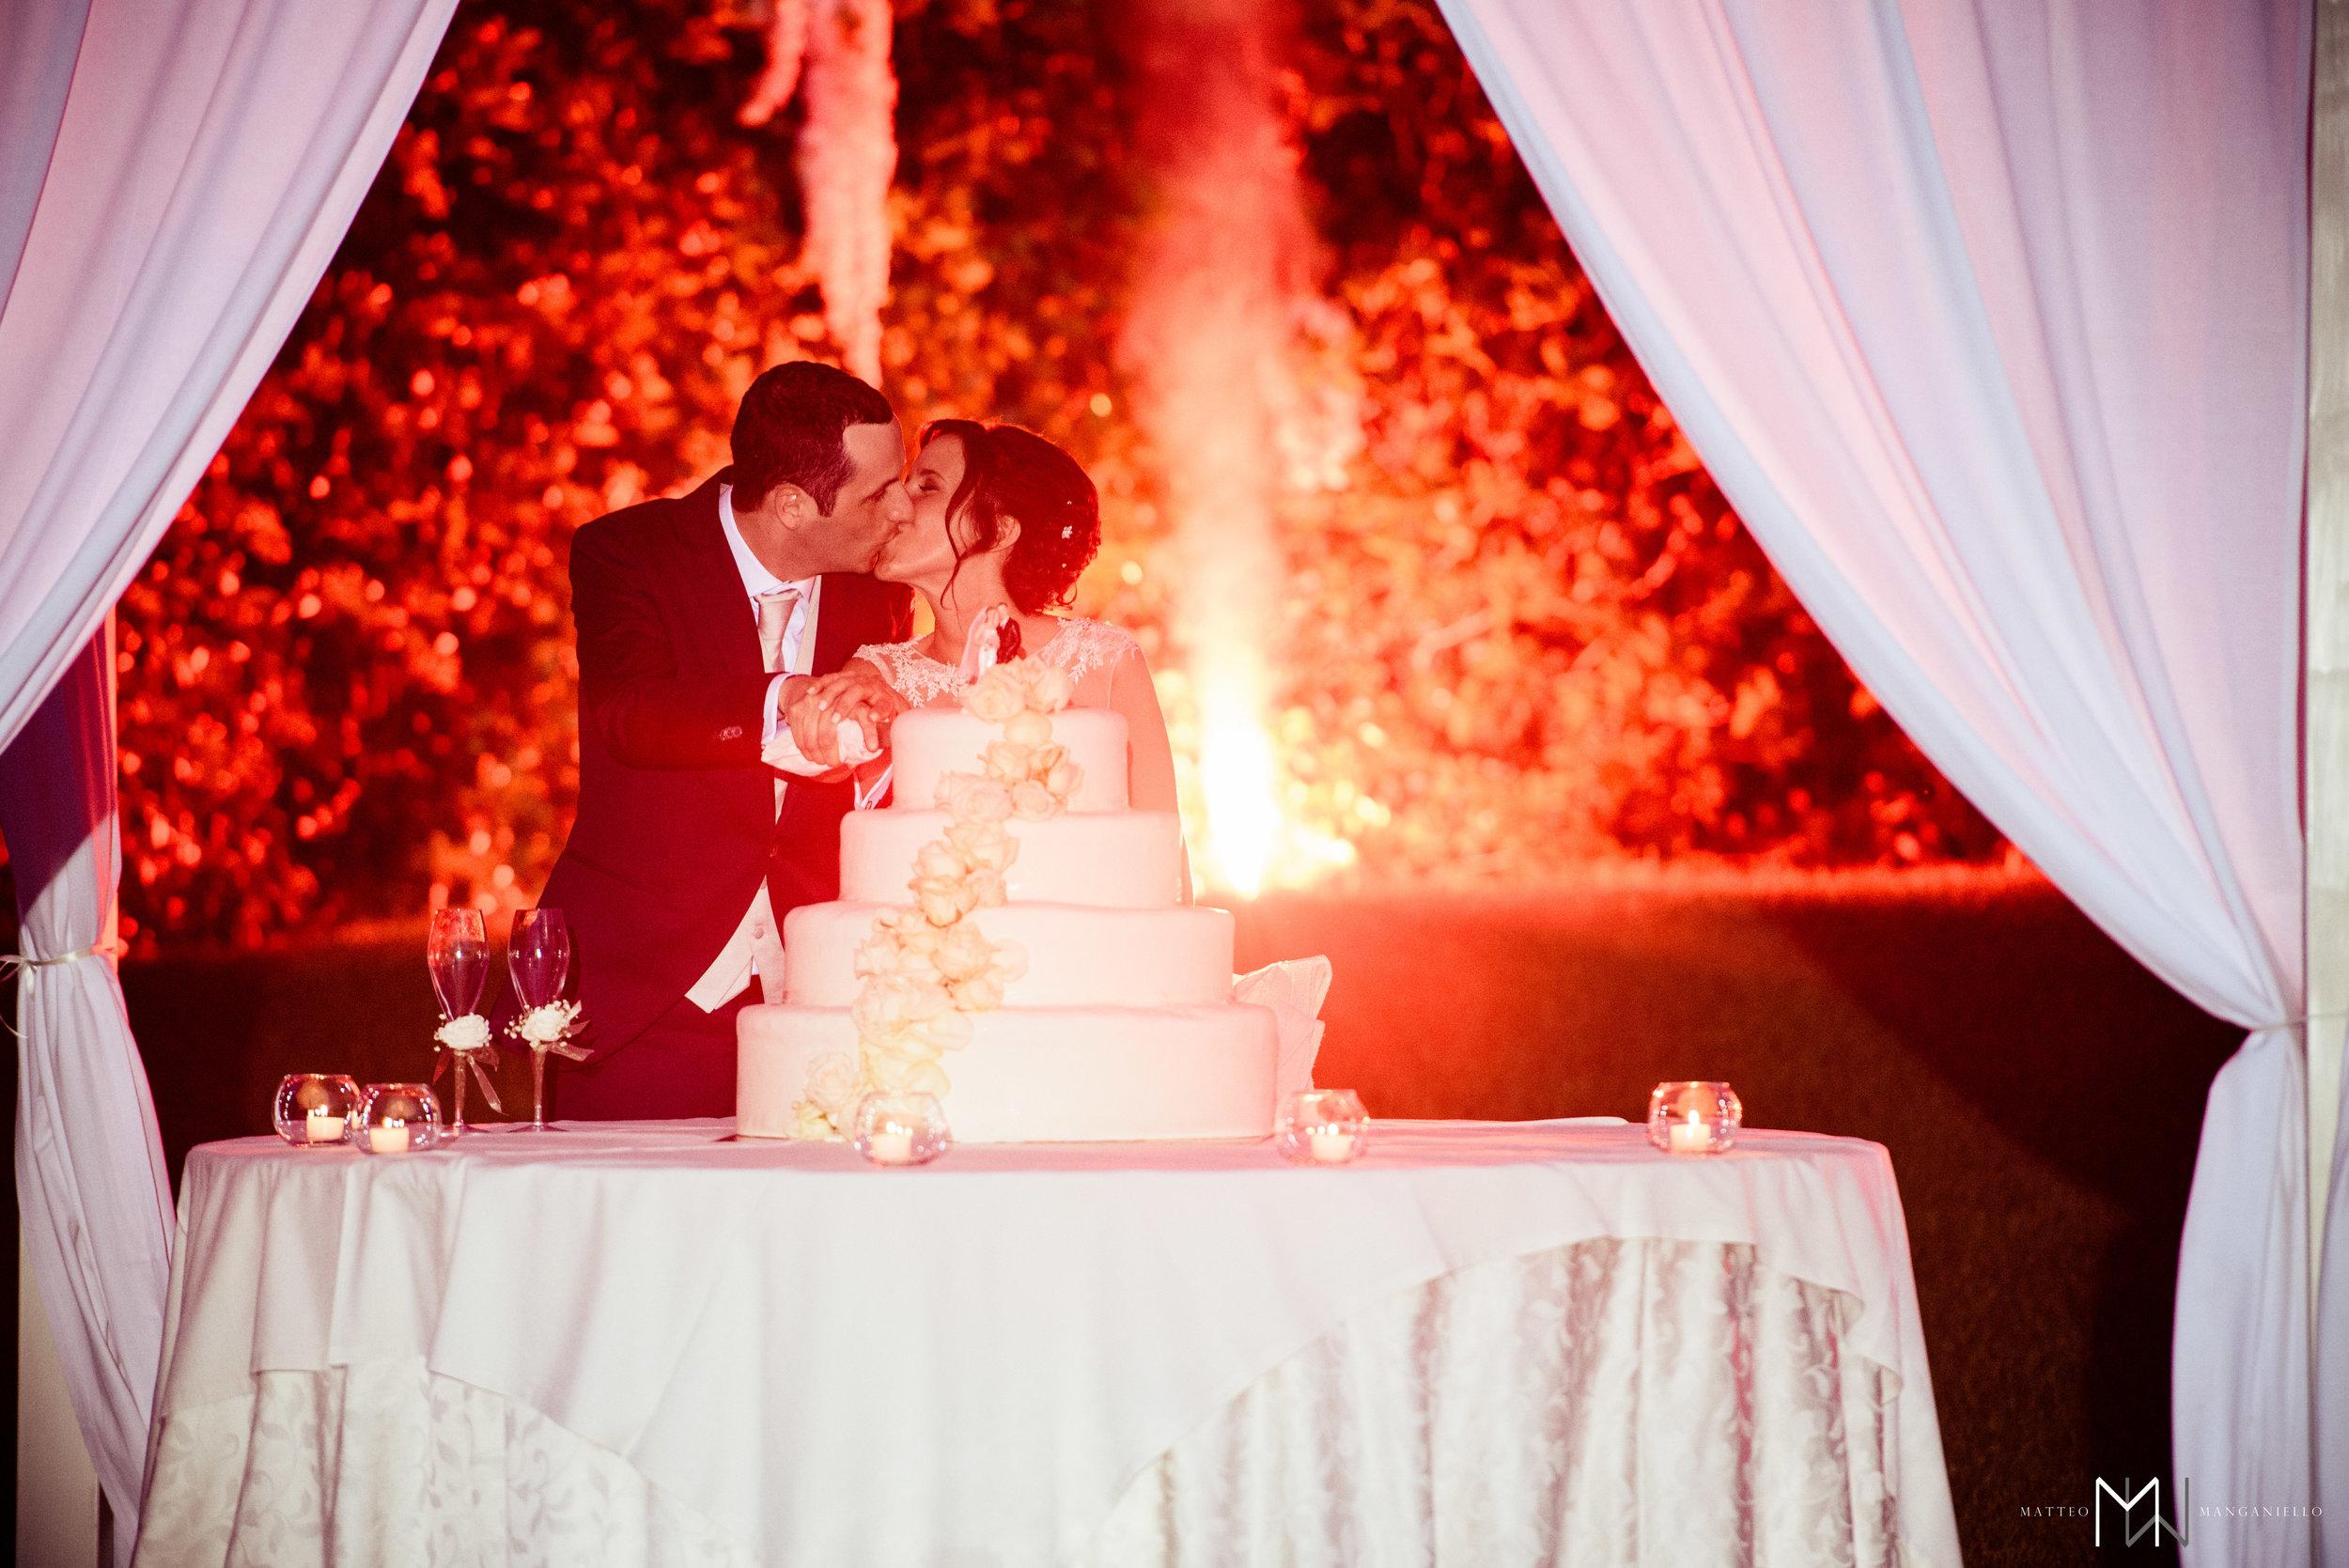 matrimonio-padova-fotografo-coppia.jpg